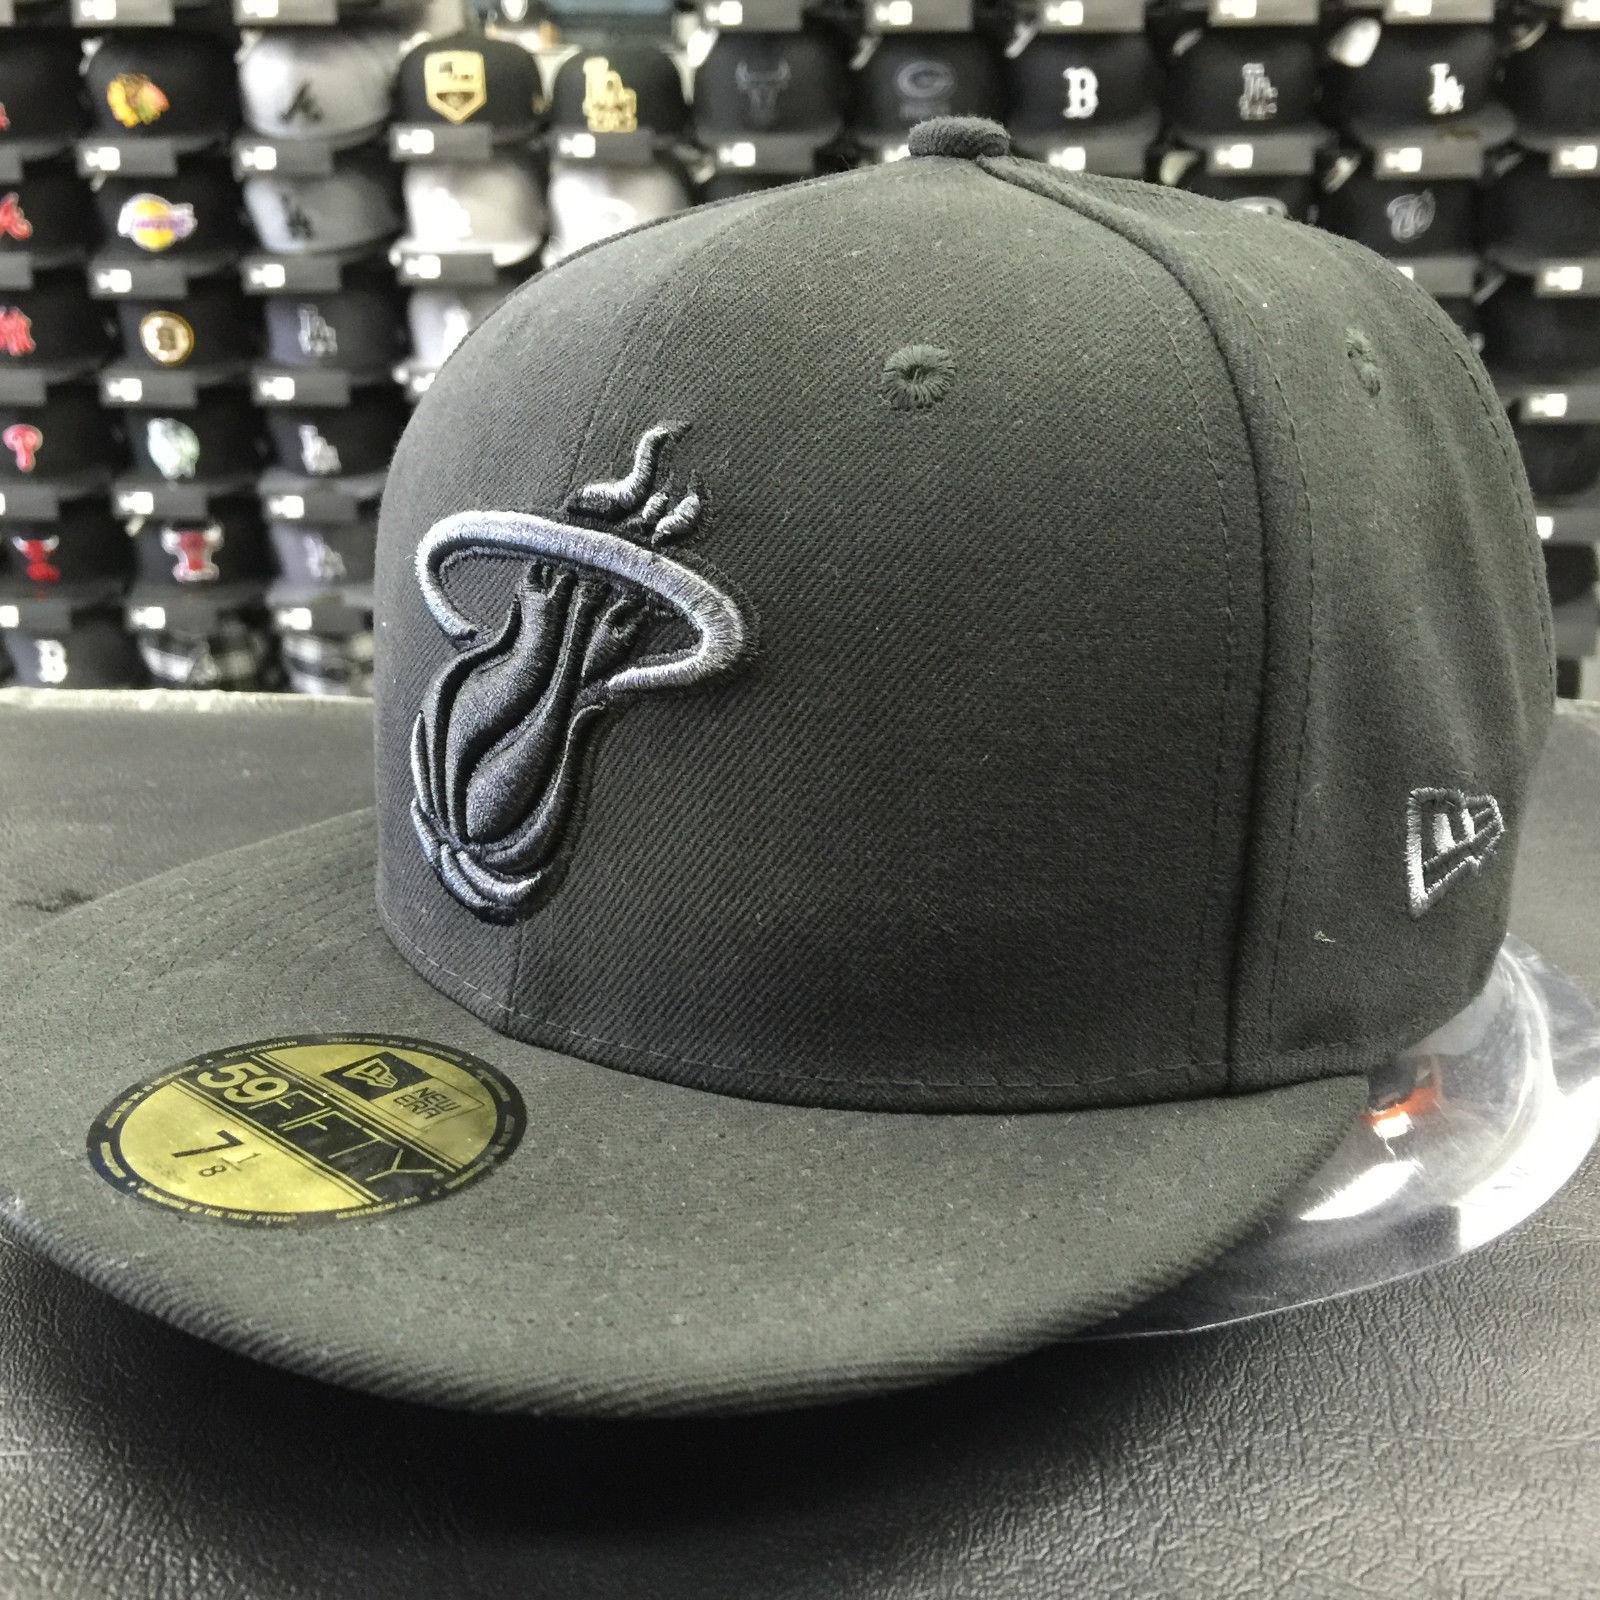 New Era 59Fifty NBA Miami Heat Black Gray Basic Fitted Cap